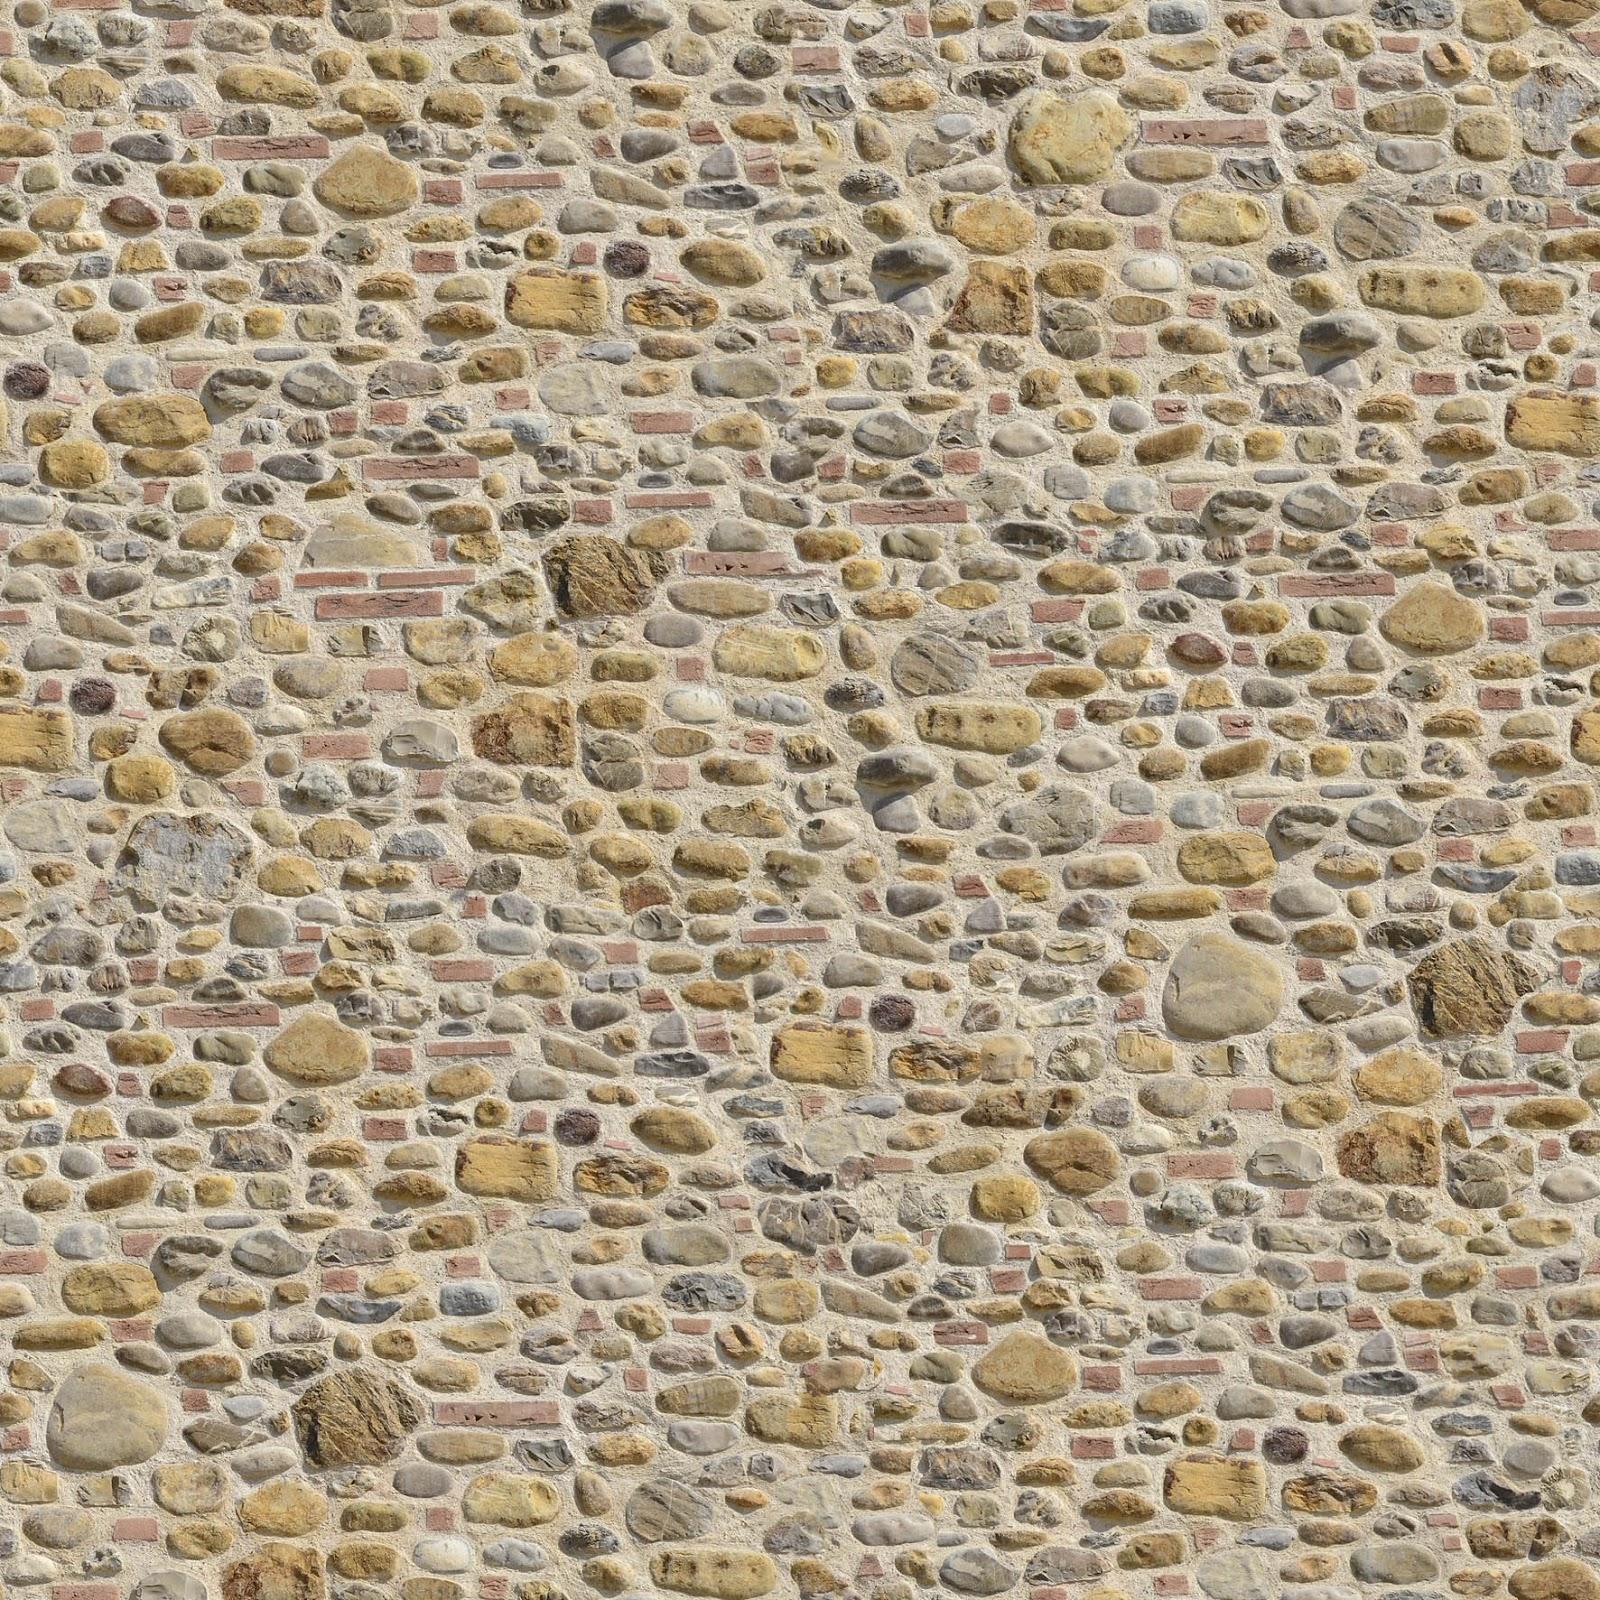 Texture misto pietra - Texturing and Shading - Treddi.com ...